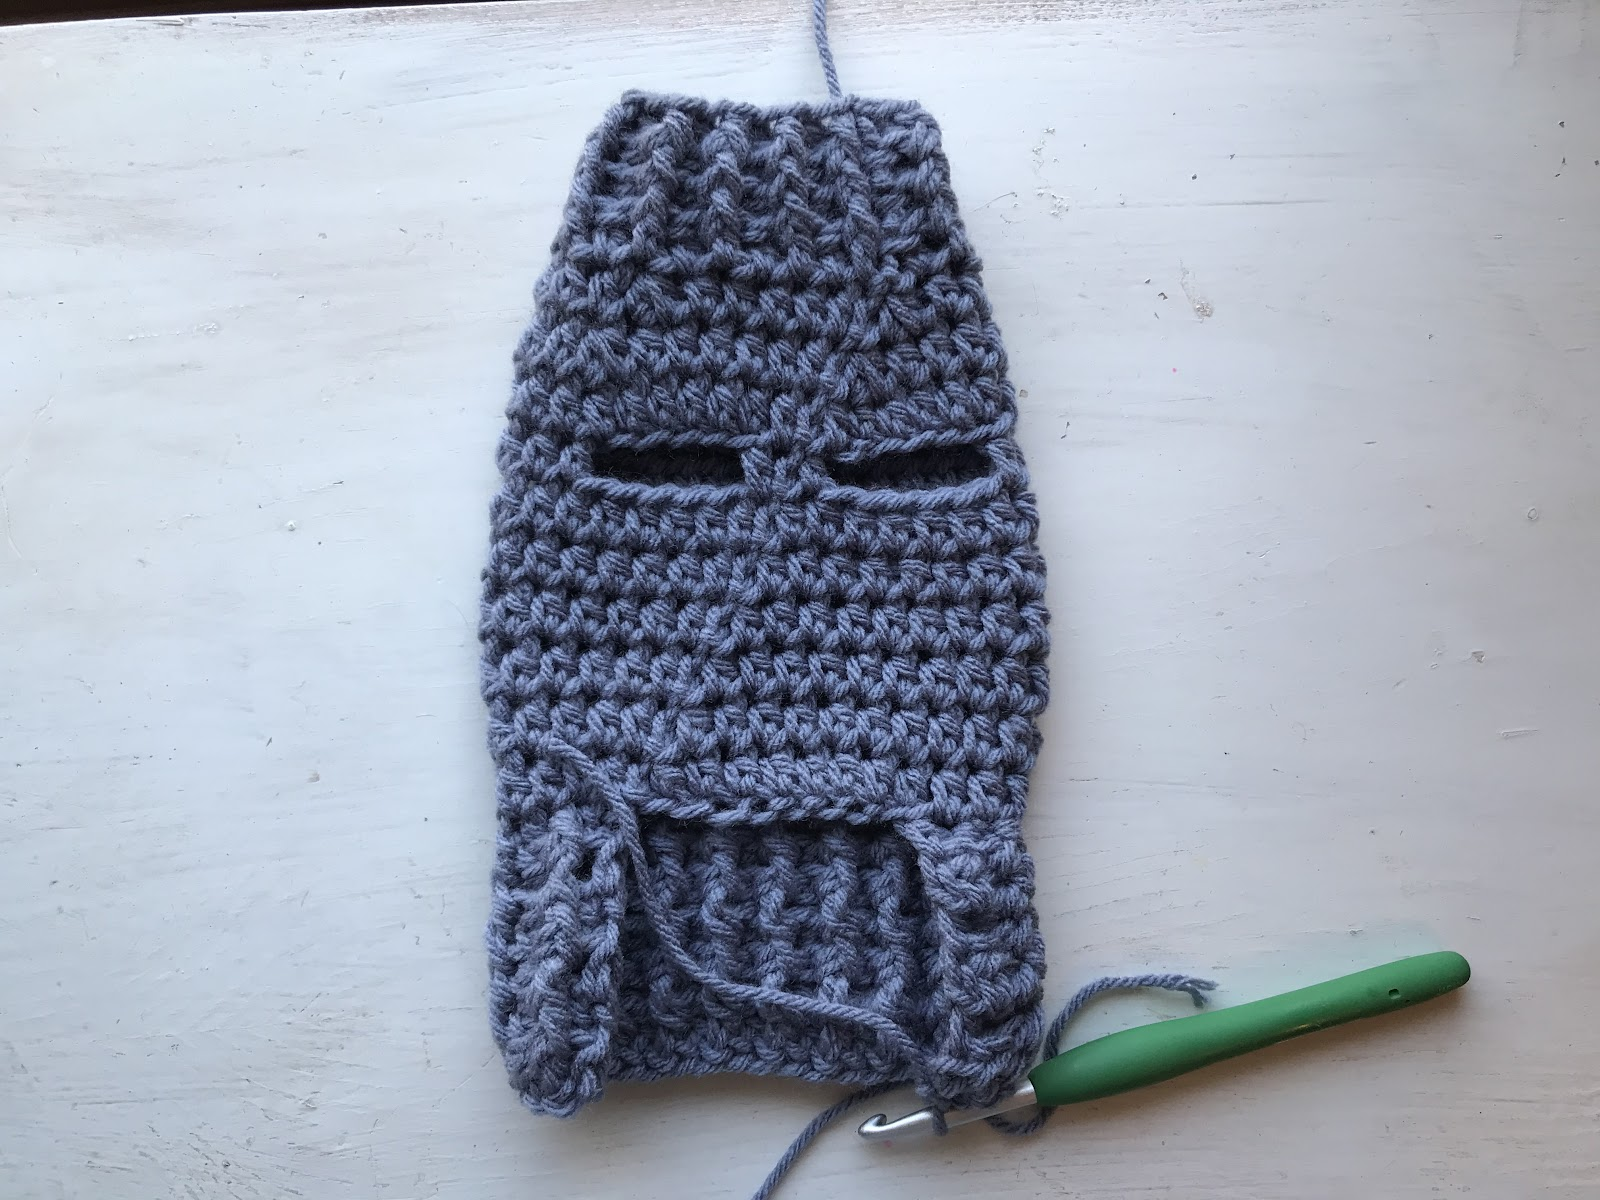 100 Crochet Dog Sweater Patterns at DogCatPin.com | 1200x1600